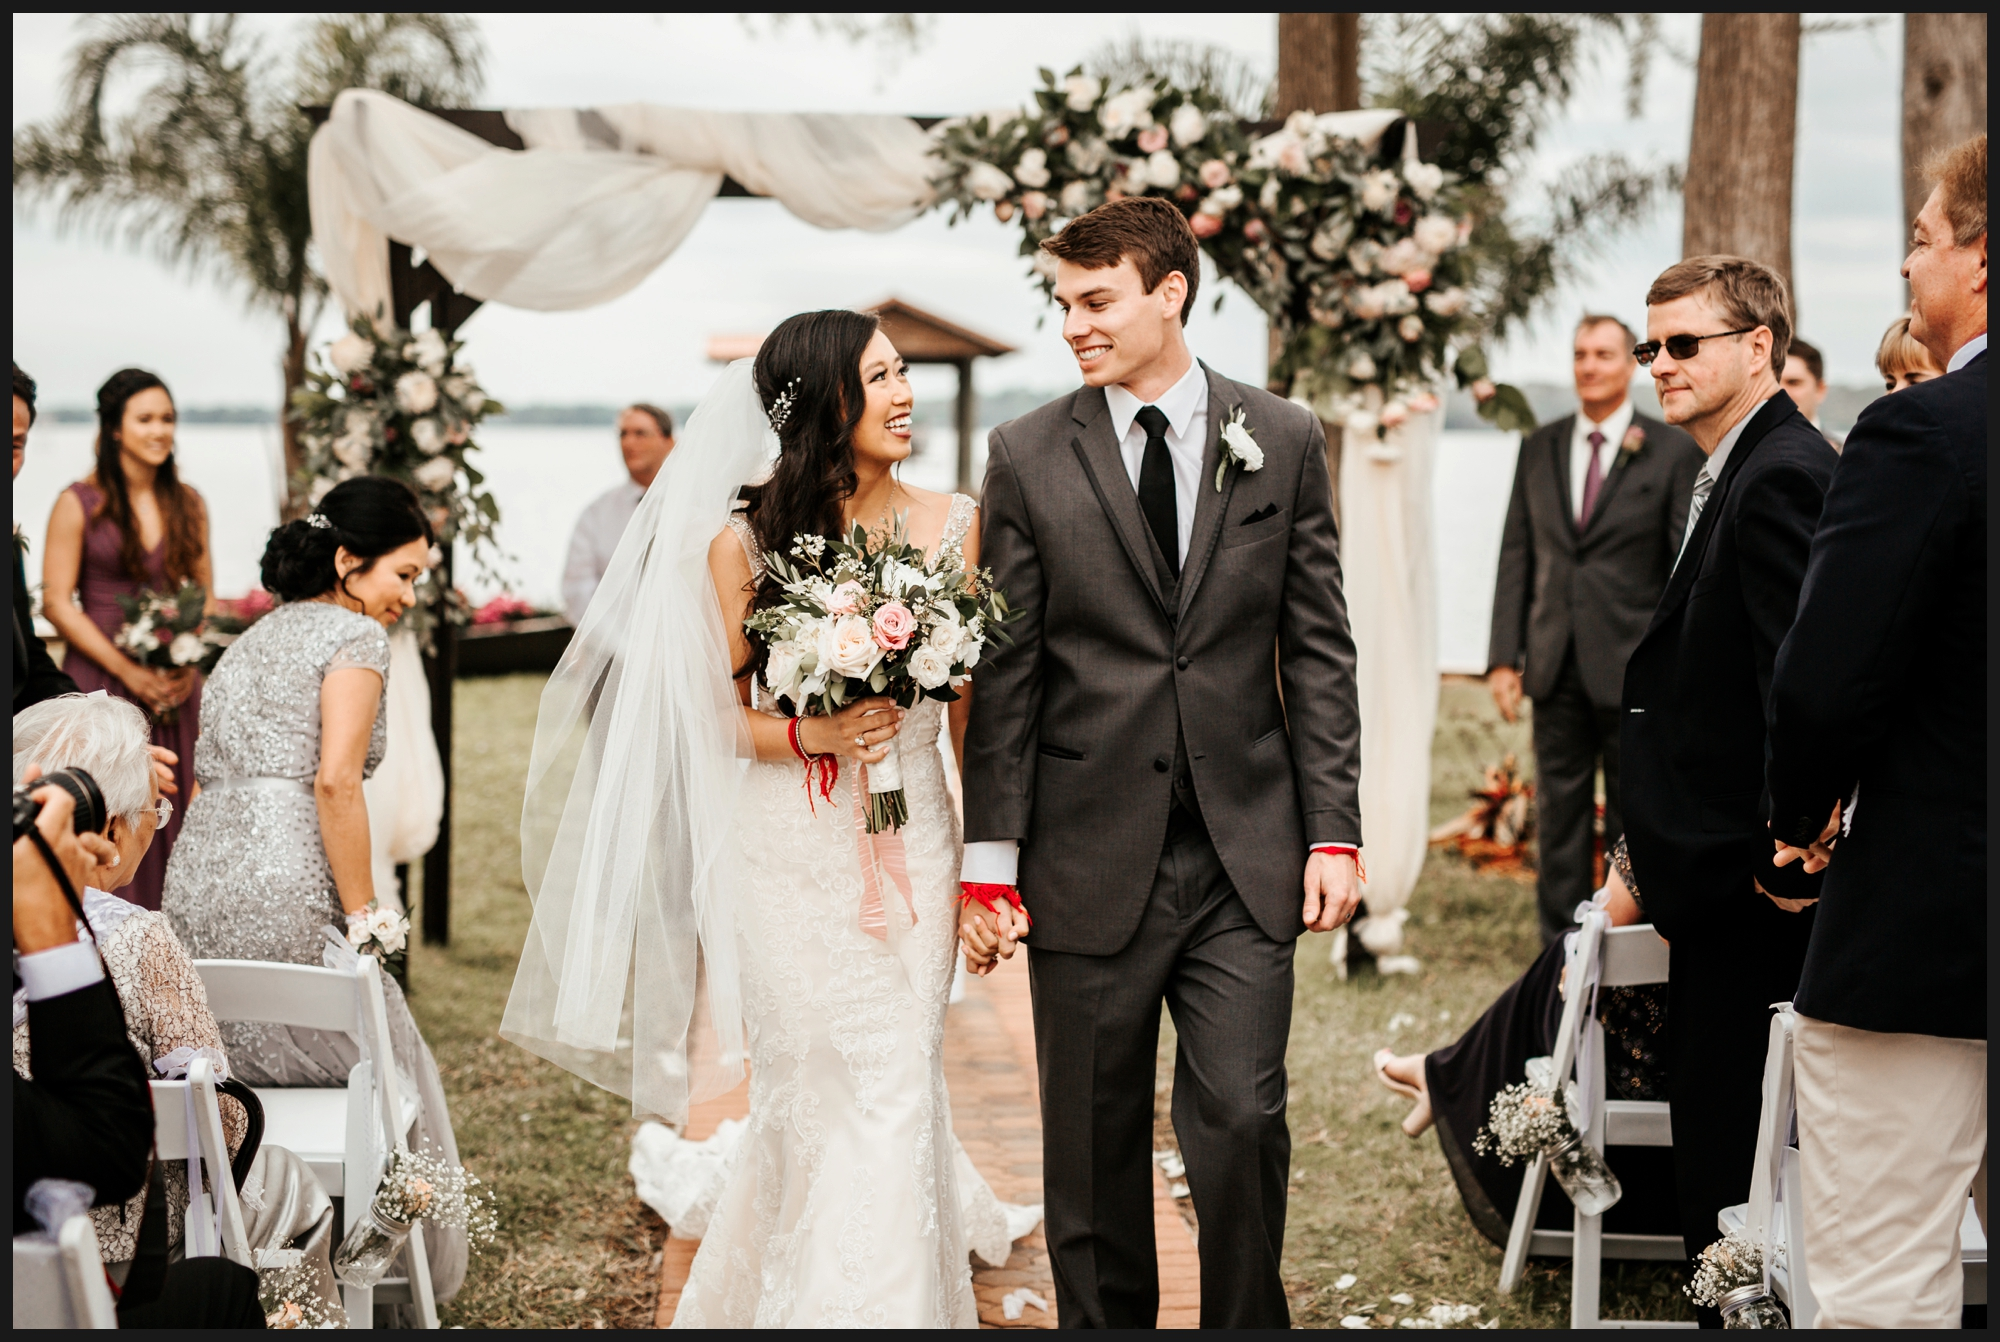 Orlando-Wedding-Photographer-destination-wedding-photographer-florida-wedding-photographer-bohemian-wedding-photographer_1432.jpg